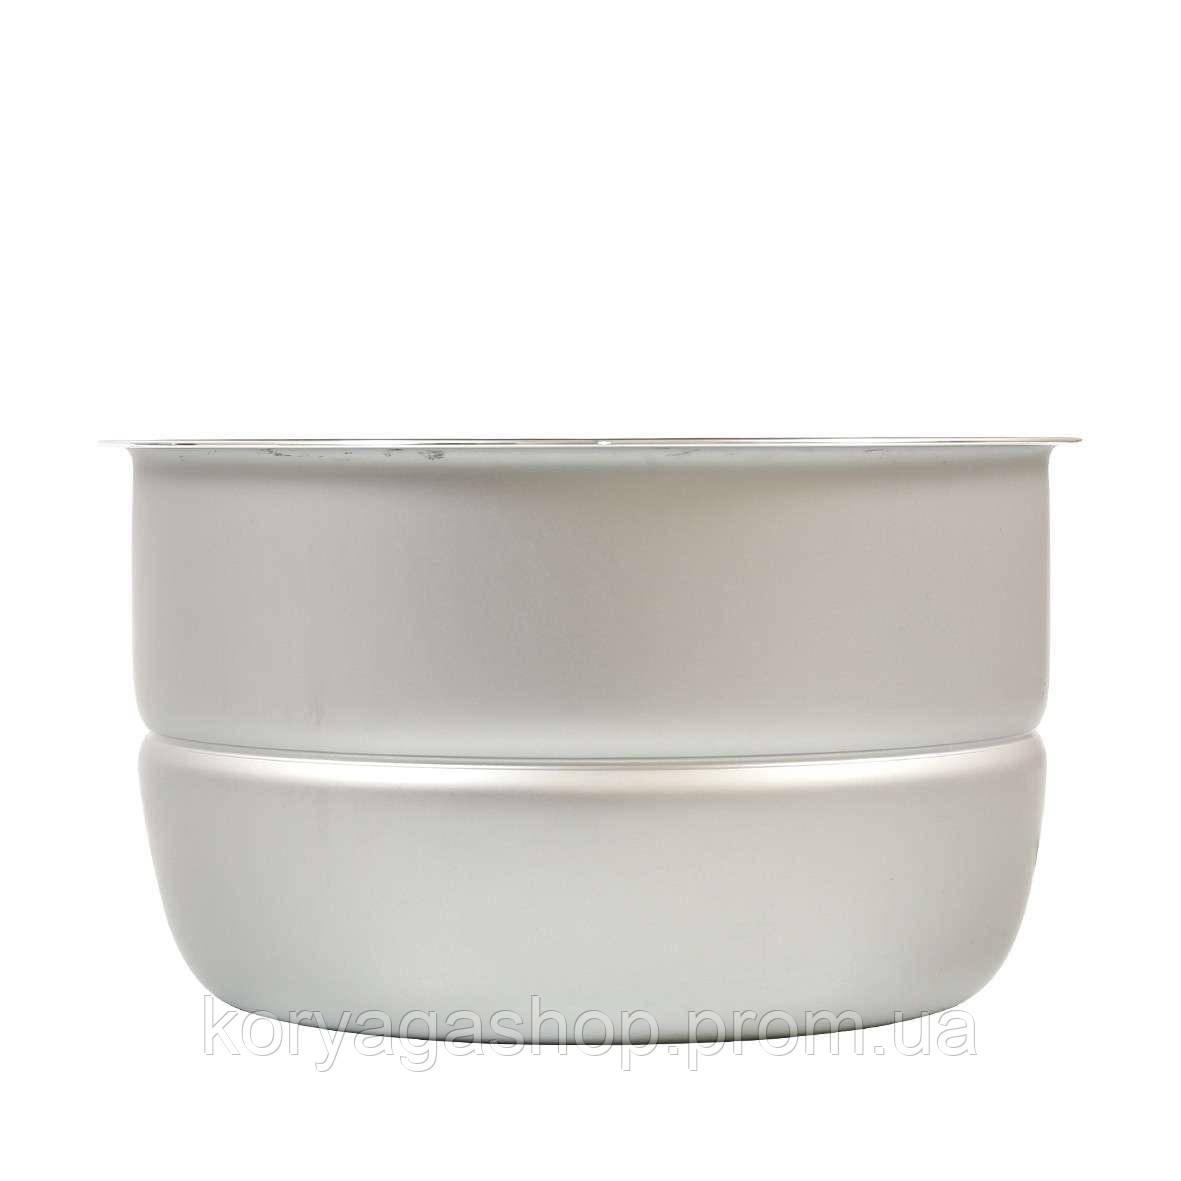 Чаша для мультиварки на 5 л Rotex RIP5053-A